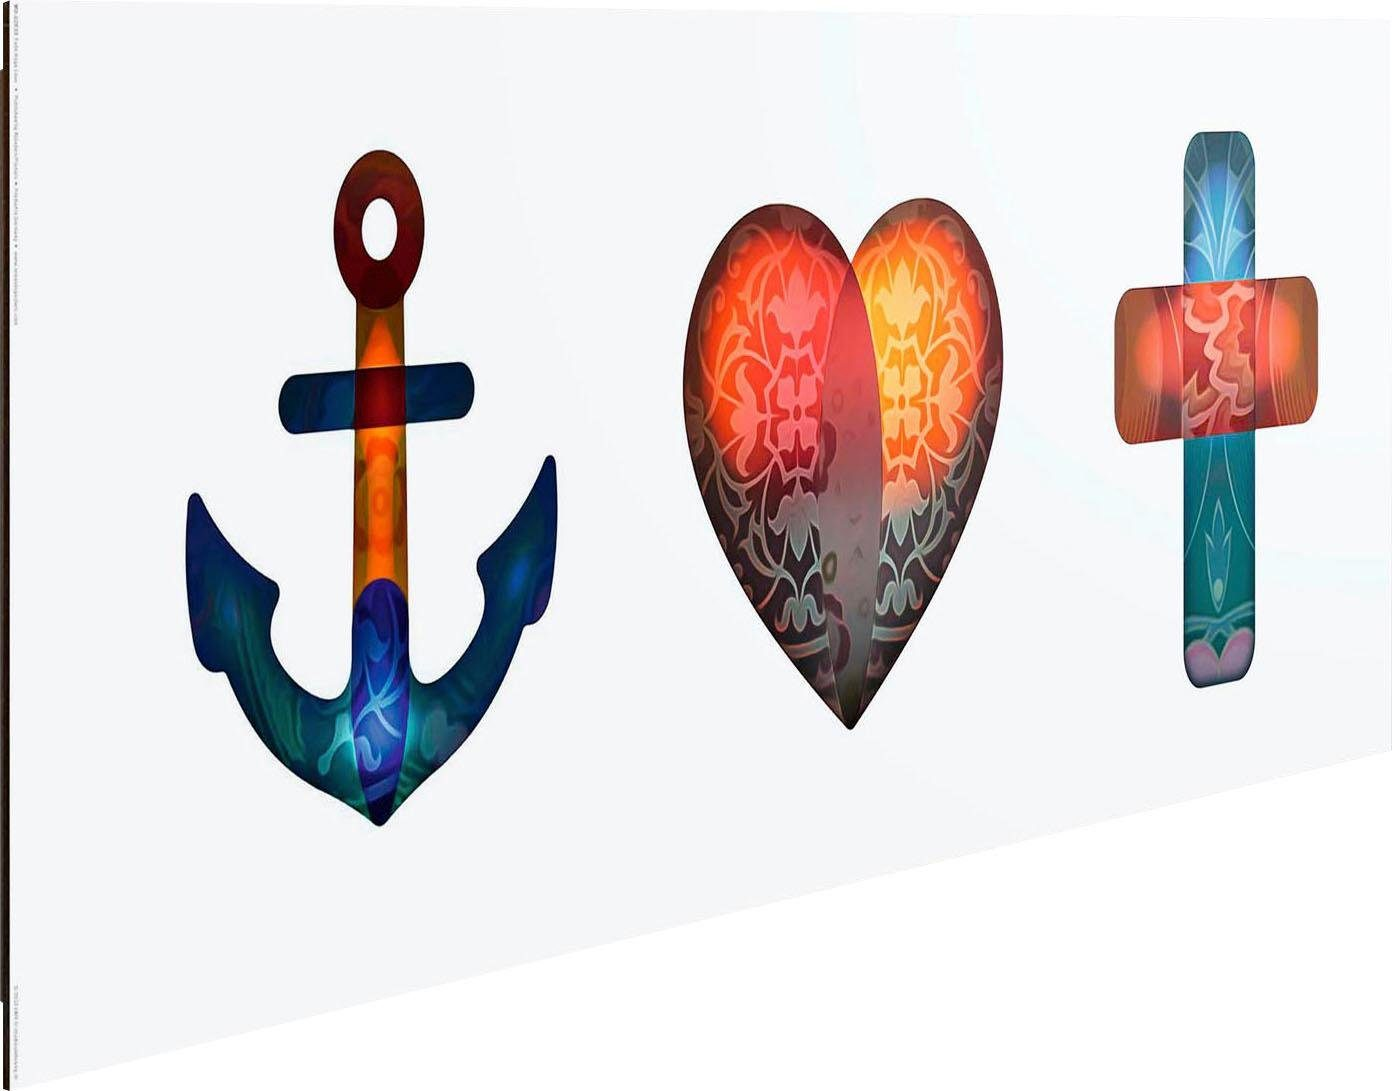 Deco-Panel »Glaube, Liebe, Hoffnung«, 90/30 cm